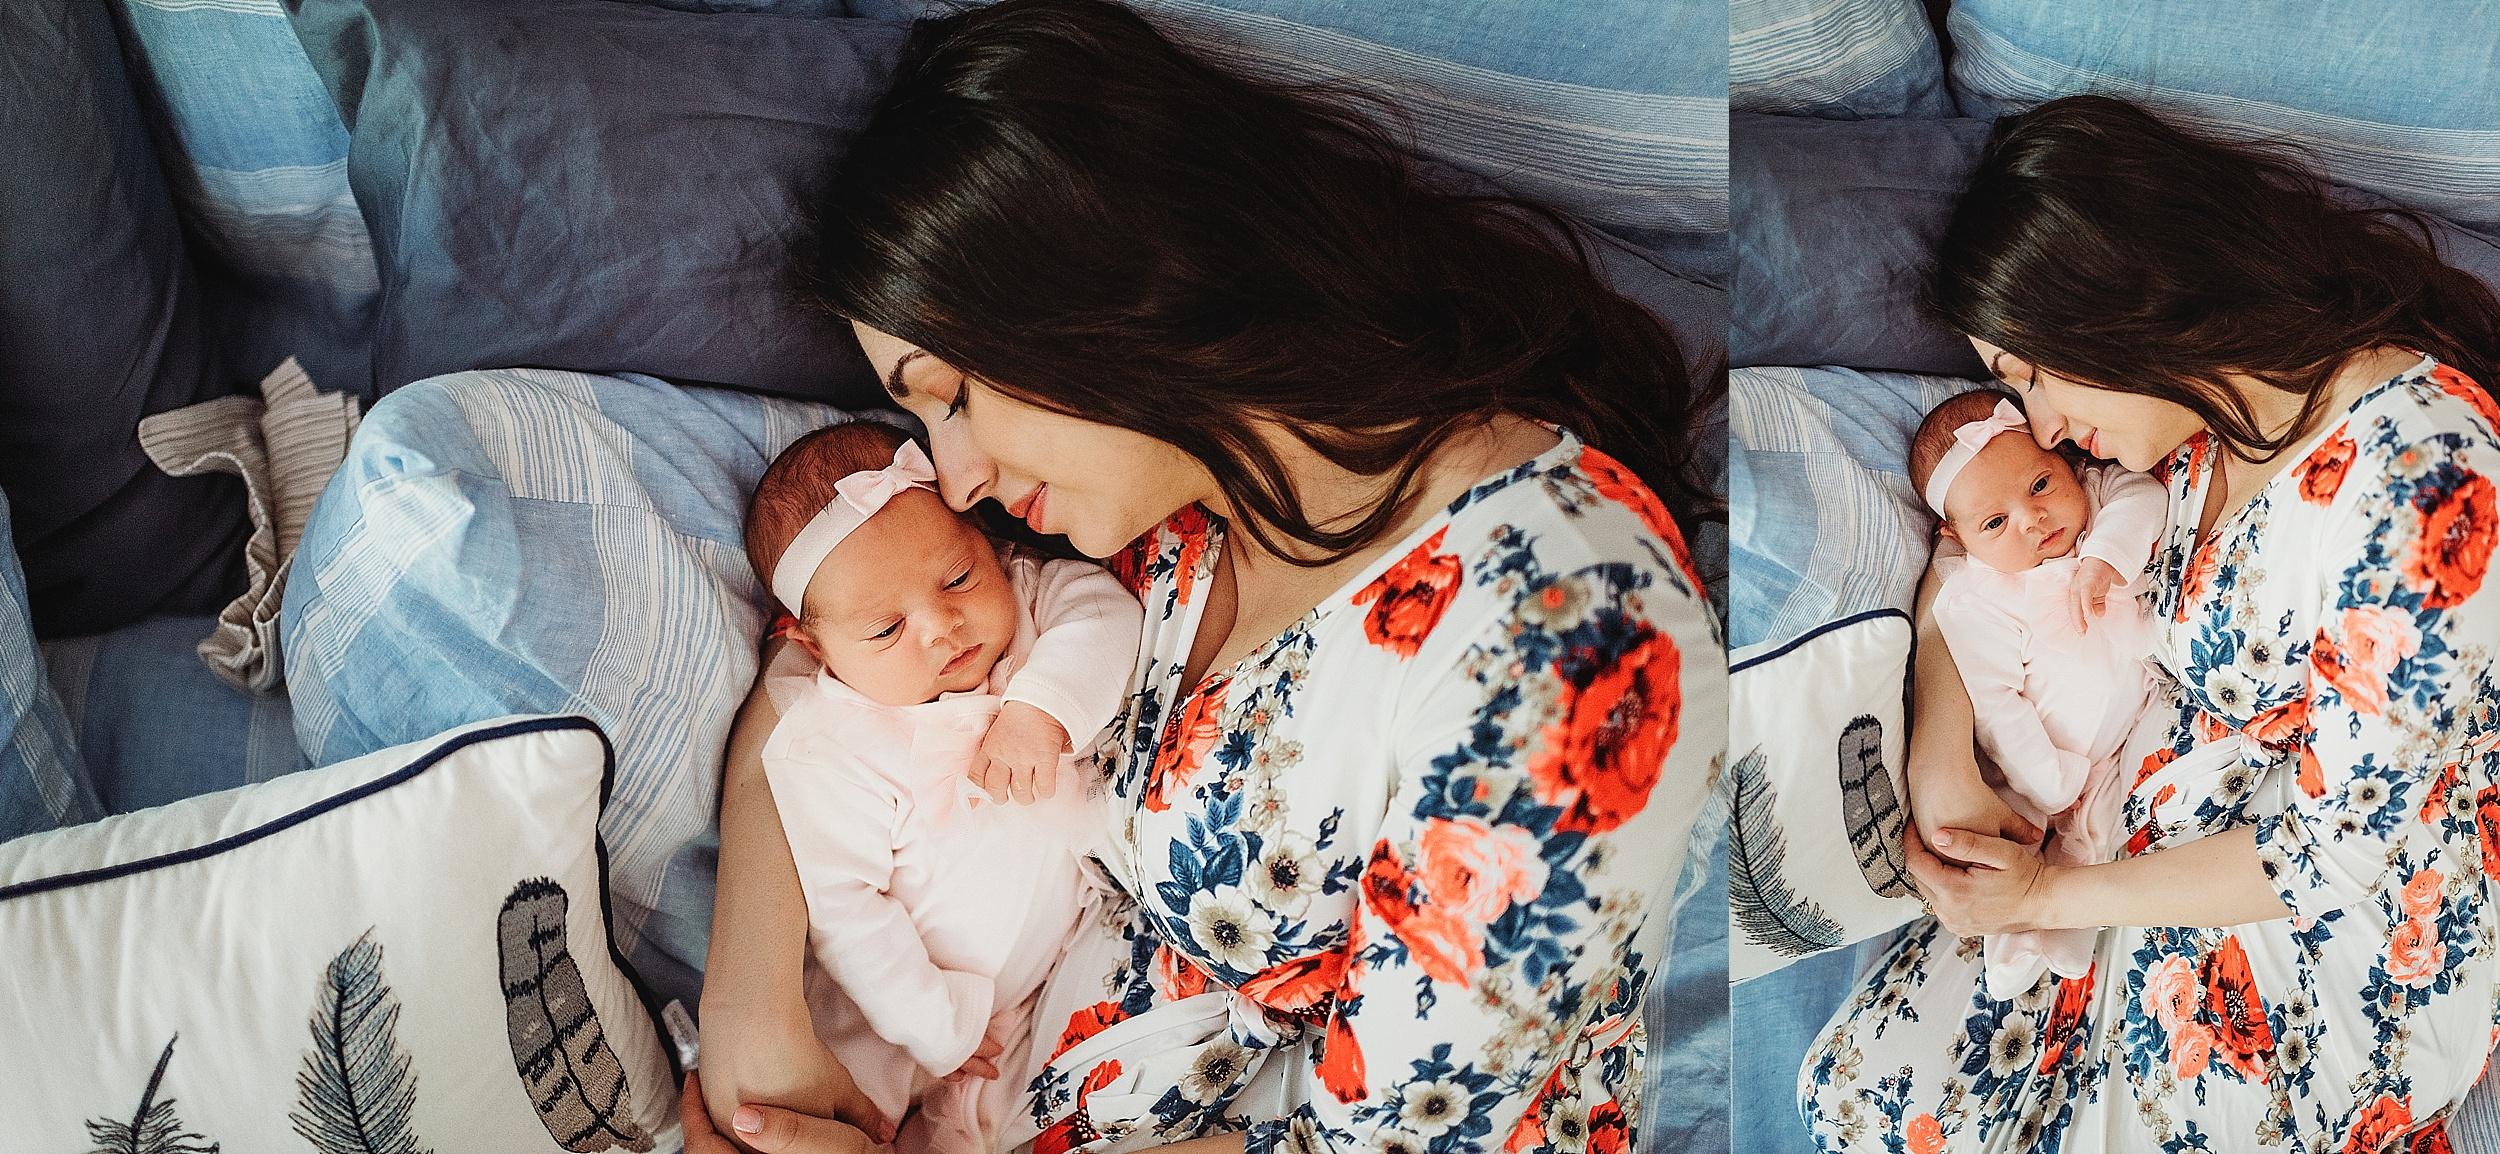 lauren-grayson-photography-akron-cleveland-ohio-photographer-family-newborn-home-photo-session-grace-a_0284.jpg